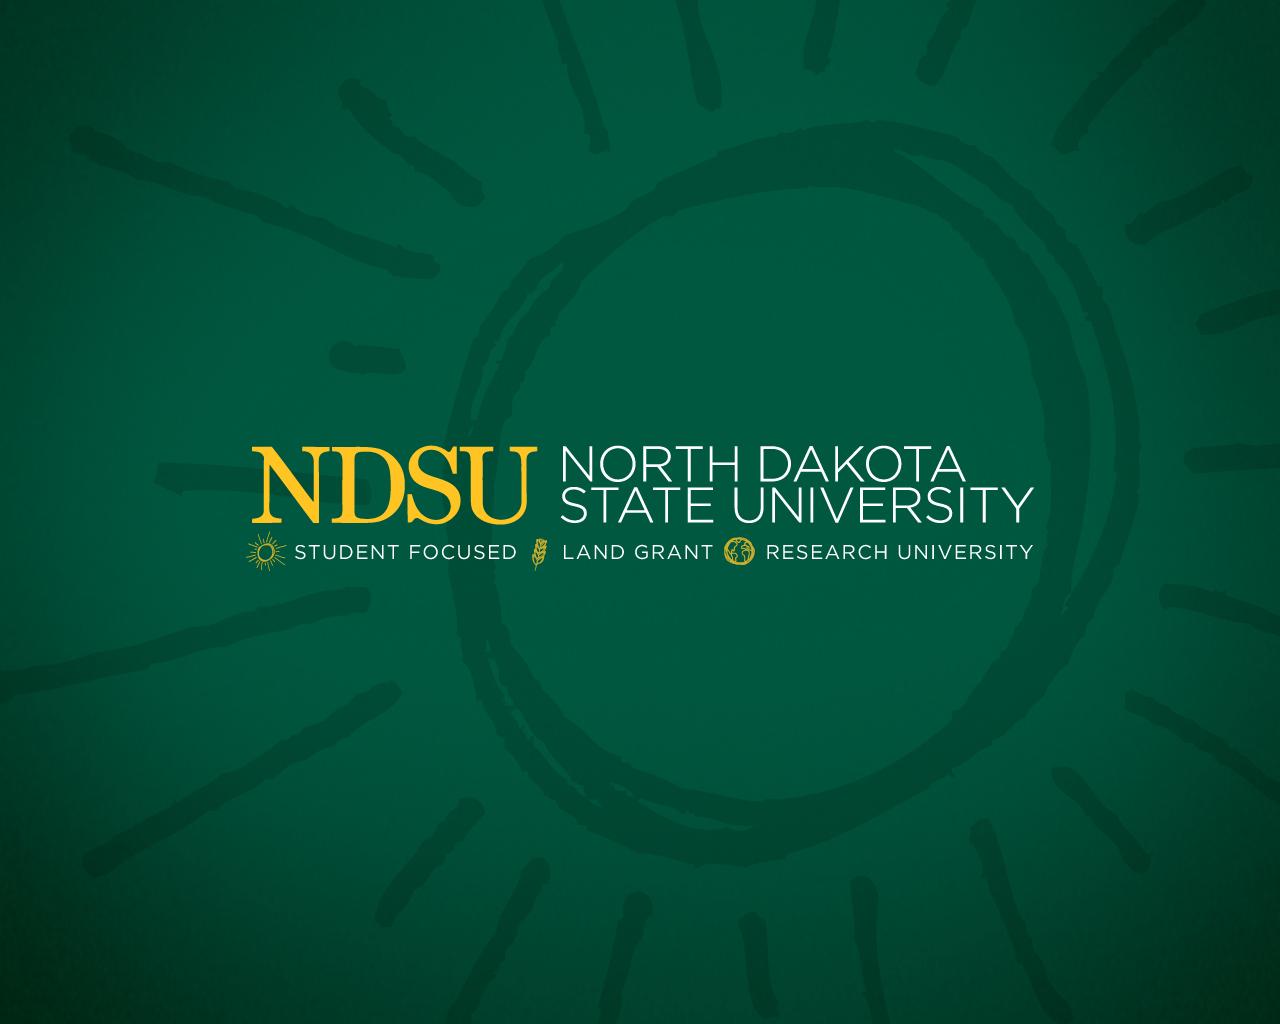 North Dakota State University 1280x1024